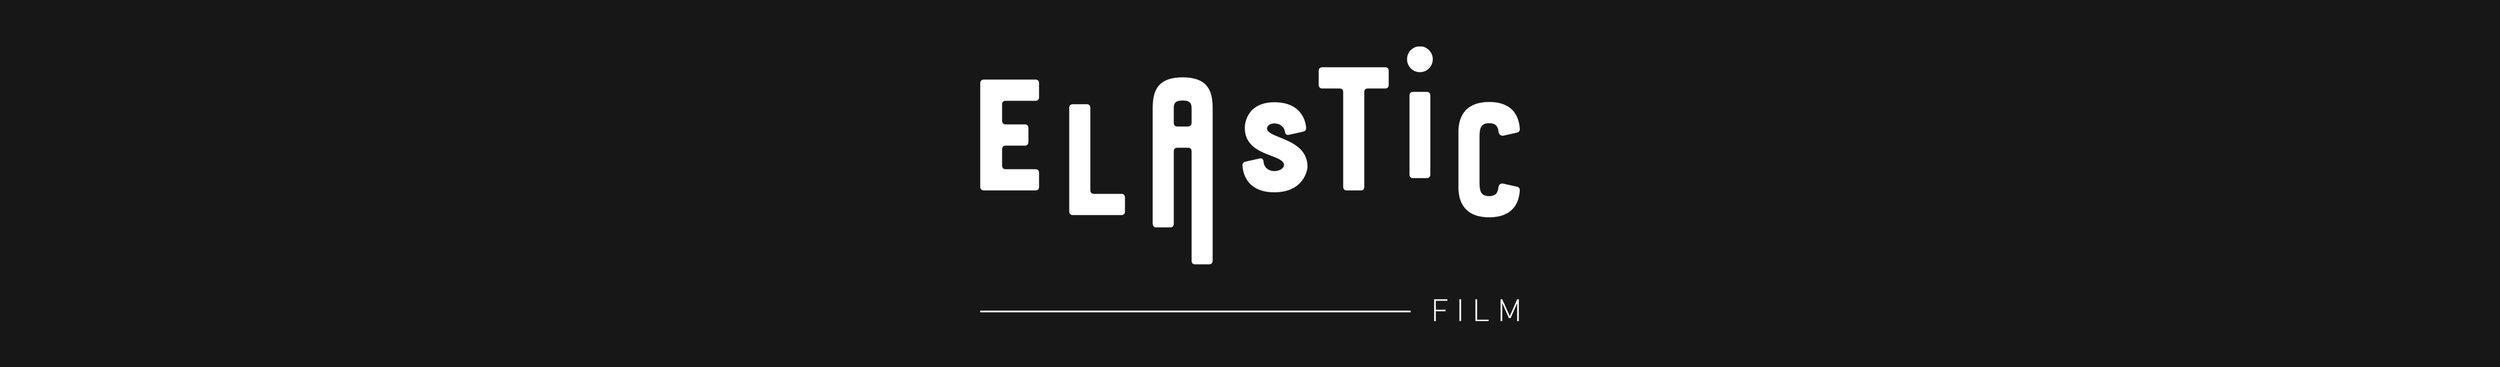 IntWebsite_Clients_White_Elastic.jpg